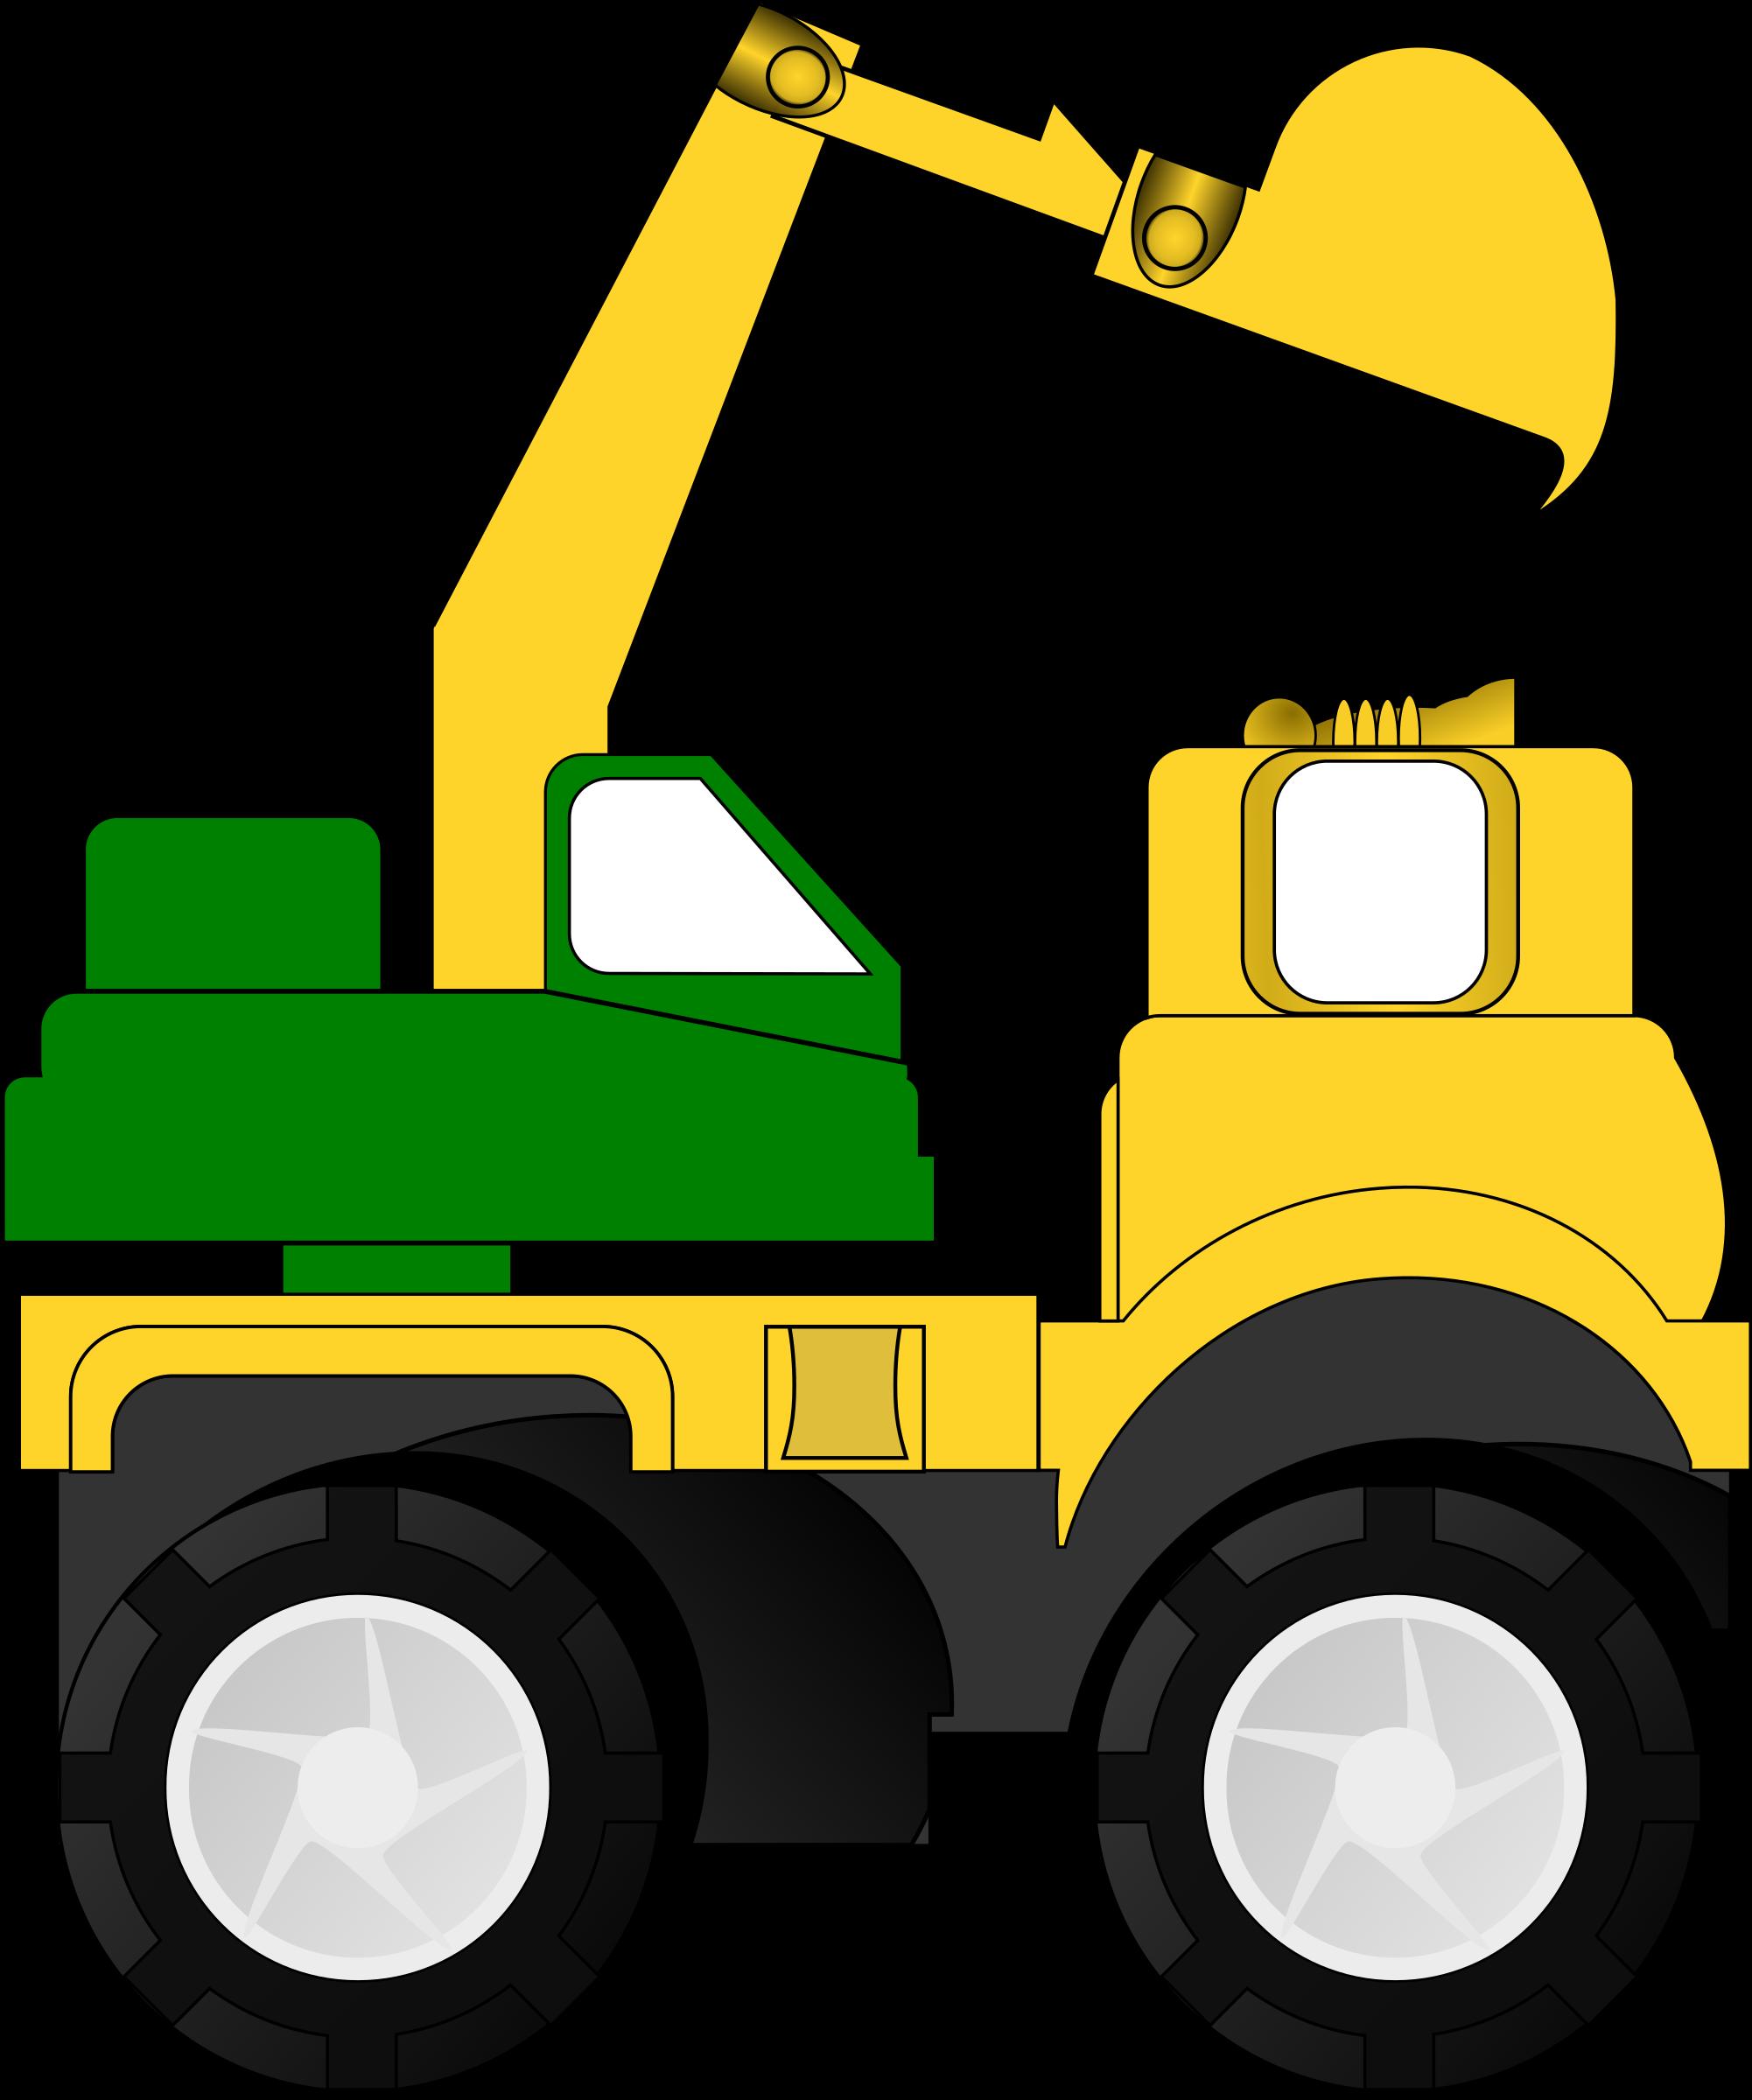 Retroexcavadora icons png free. Excavator clipart icon